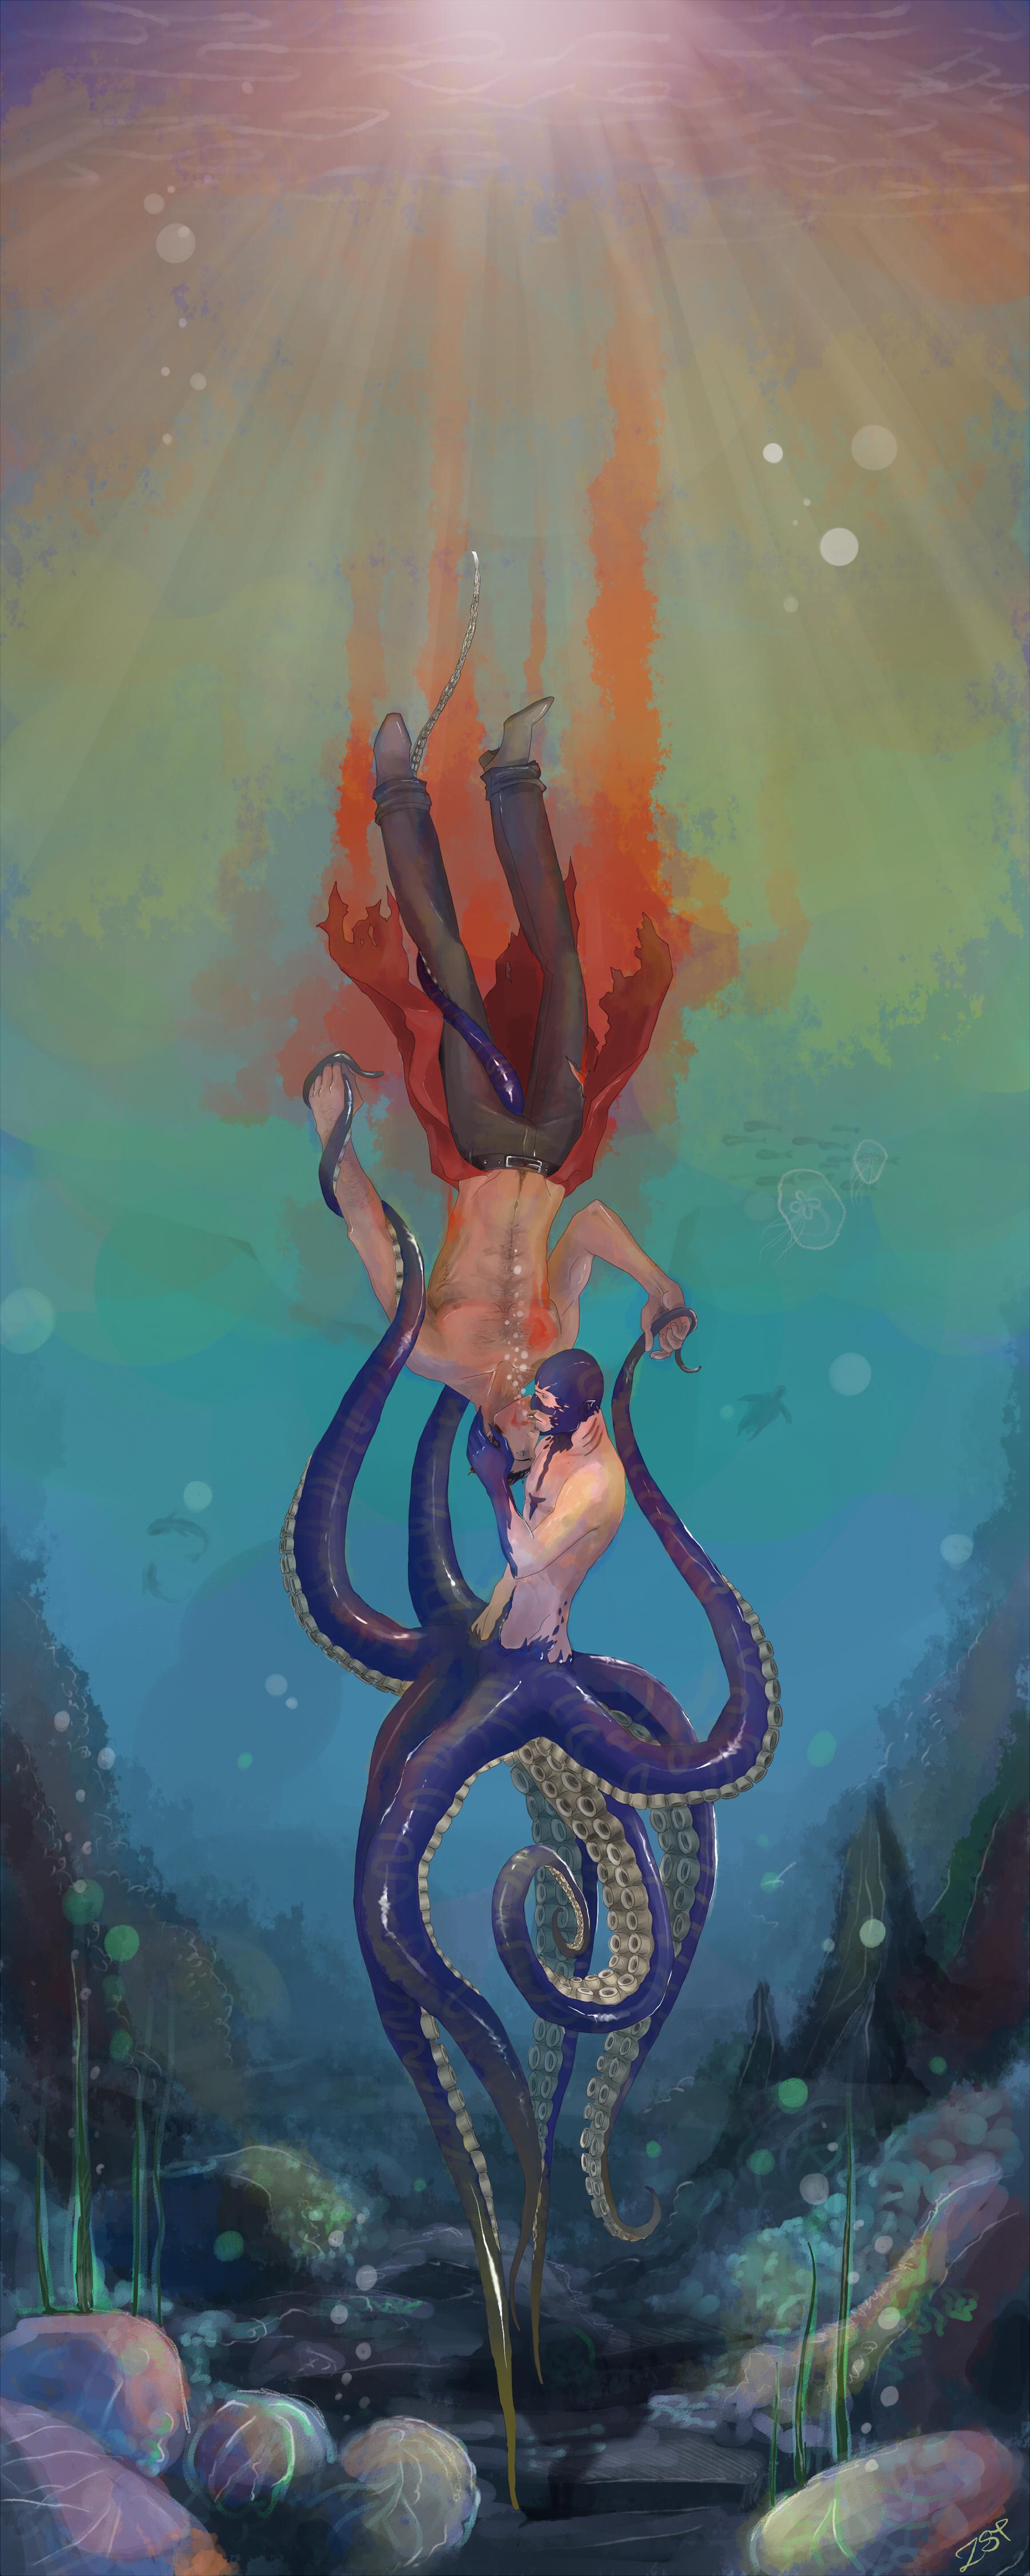 Drowning by Zartbitter-Salat